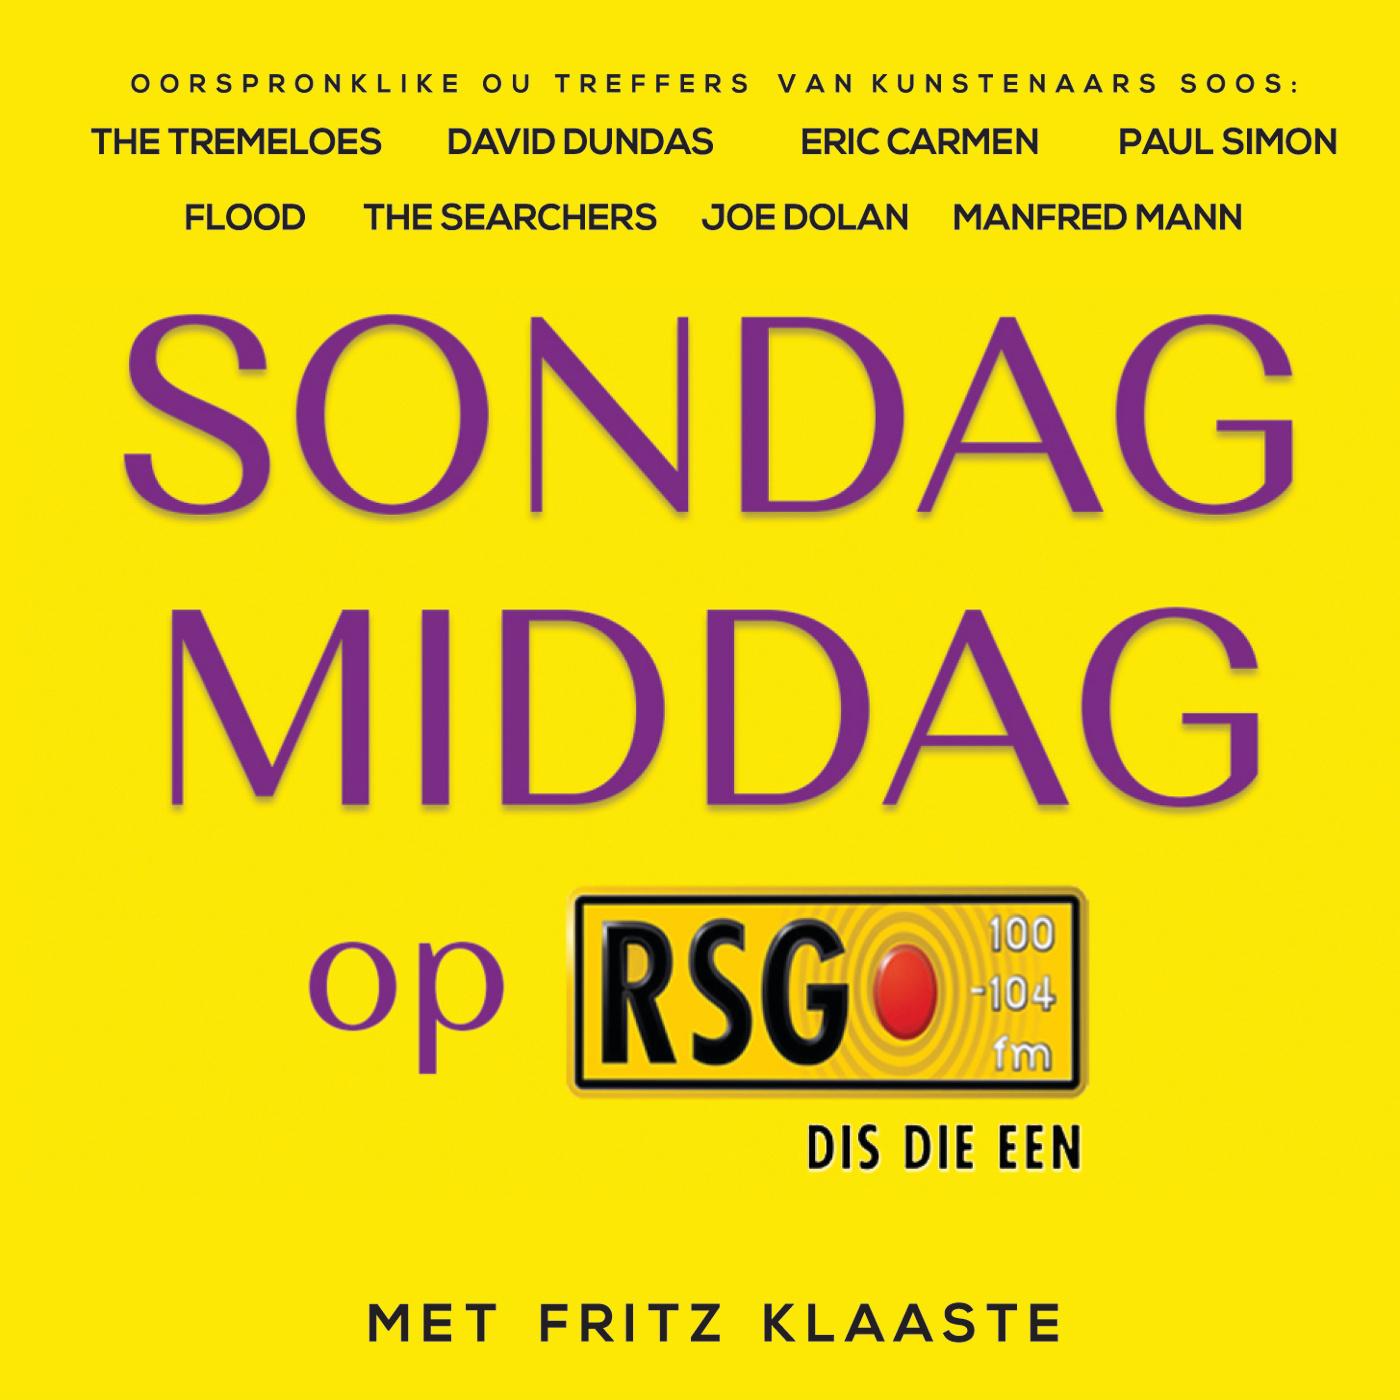 SONDAG MIDDAG OP RSG